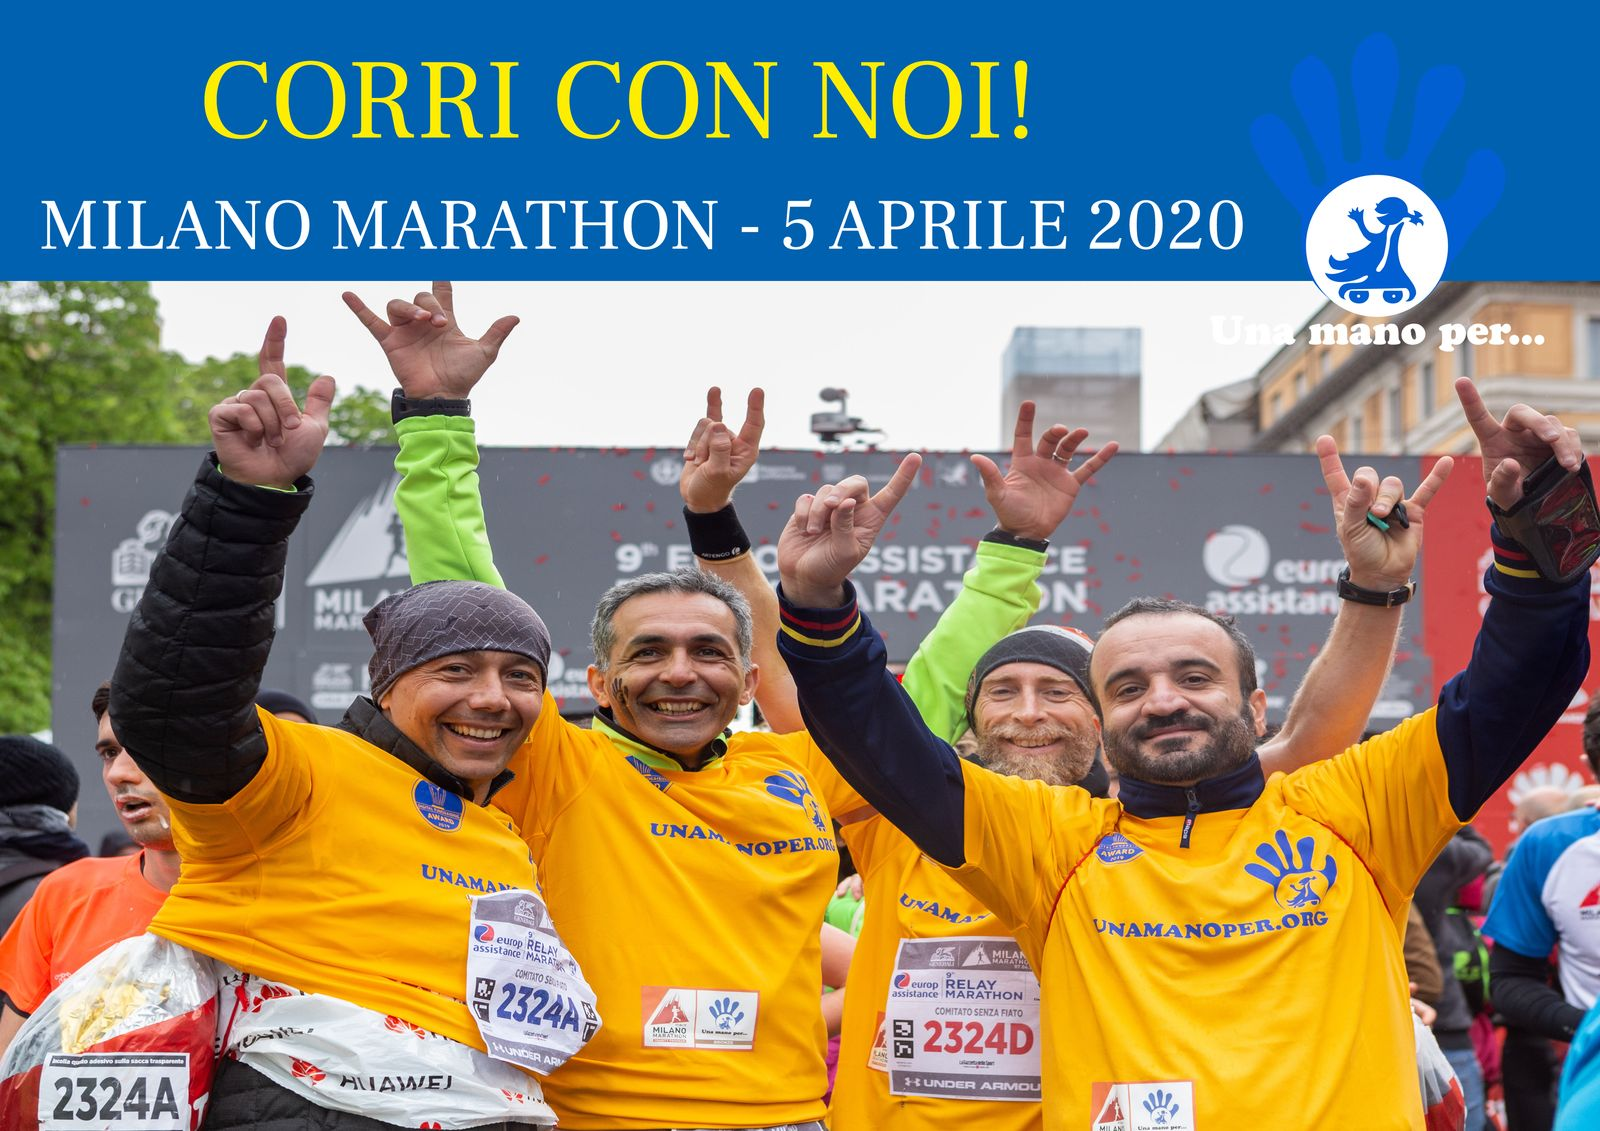 Corri con noi!